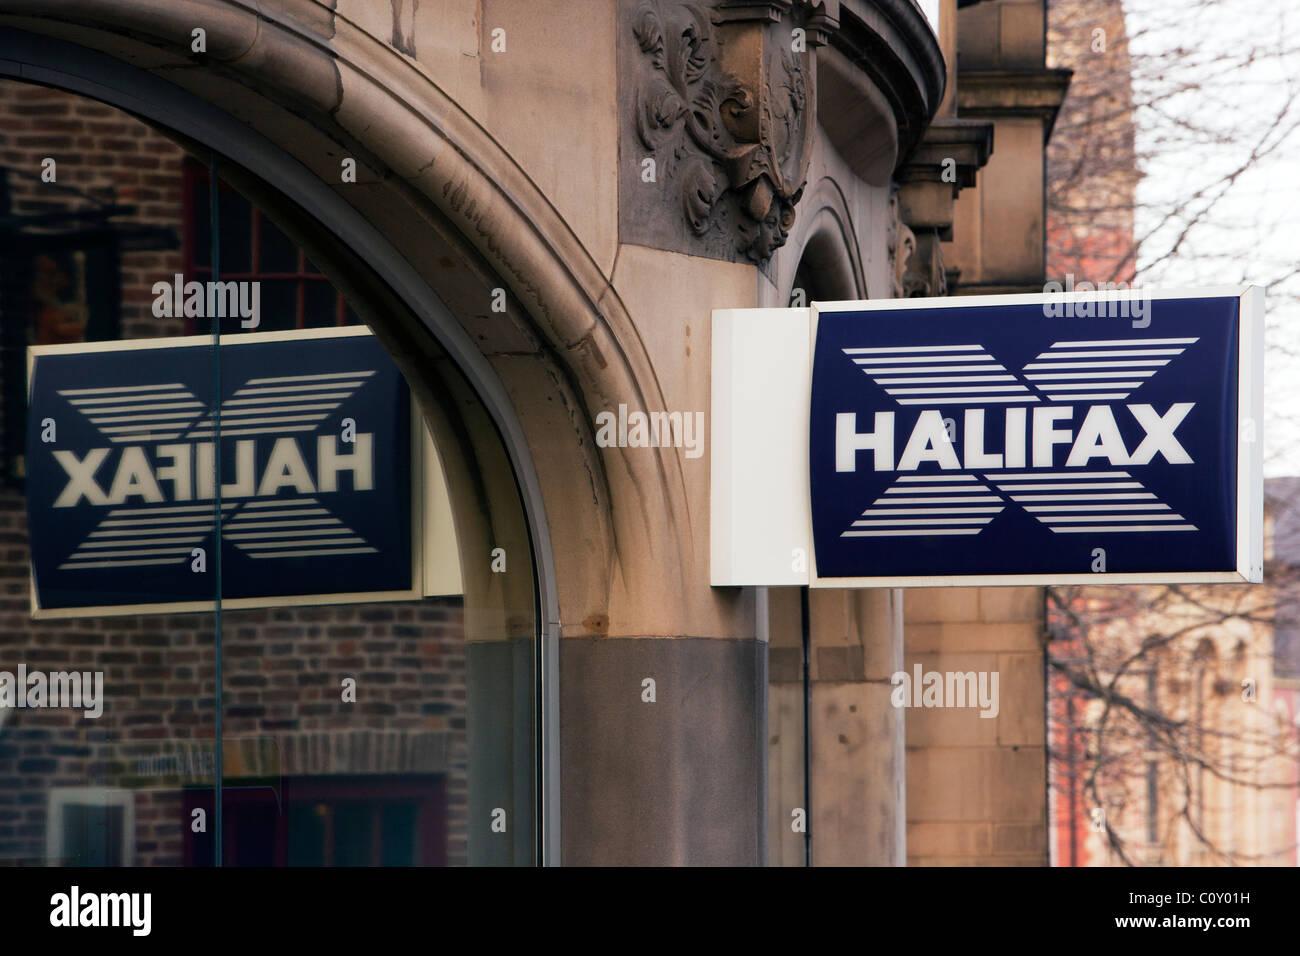 Halifax bank sign and logo - Stock Image